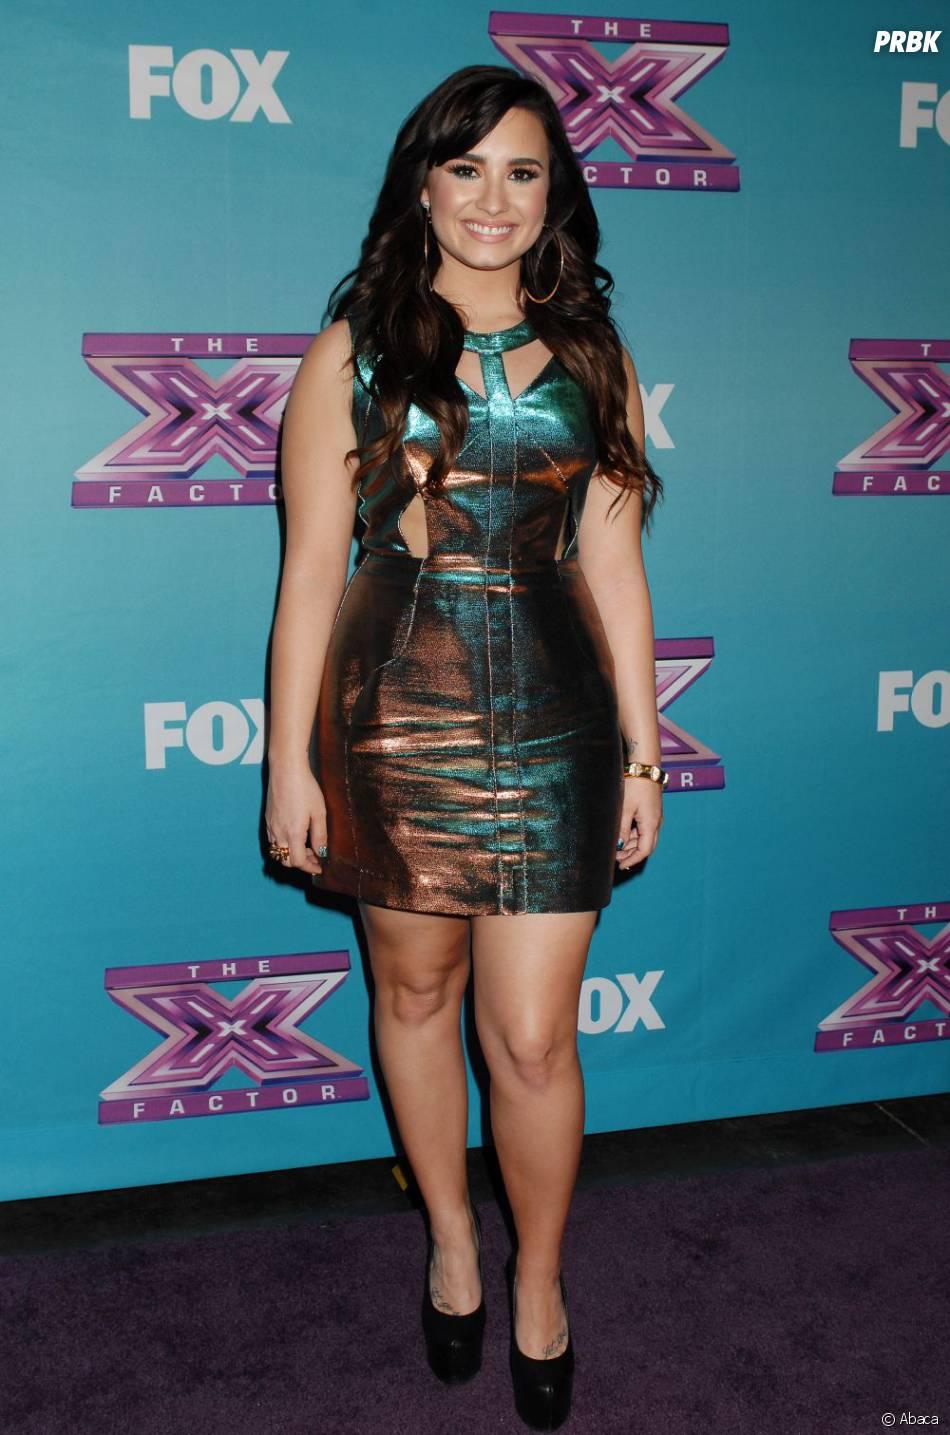 Demi Lovato Story